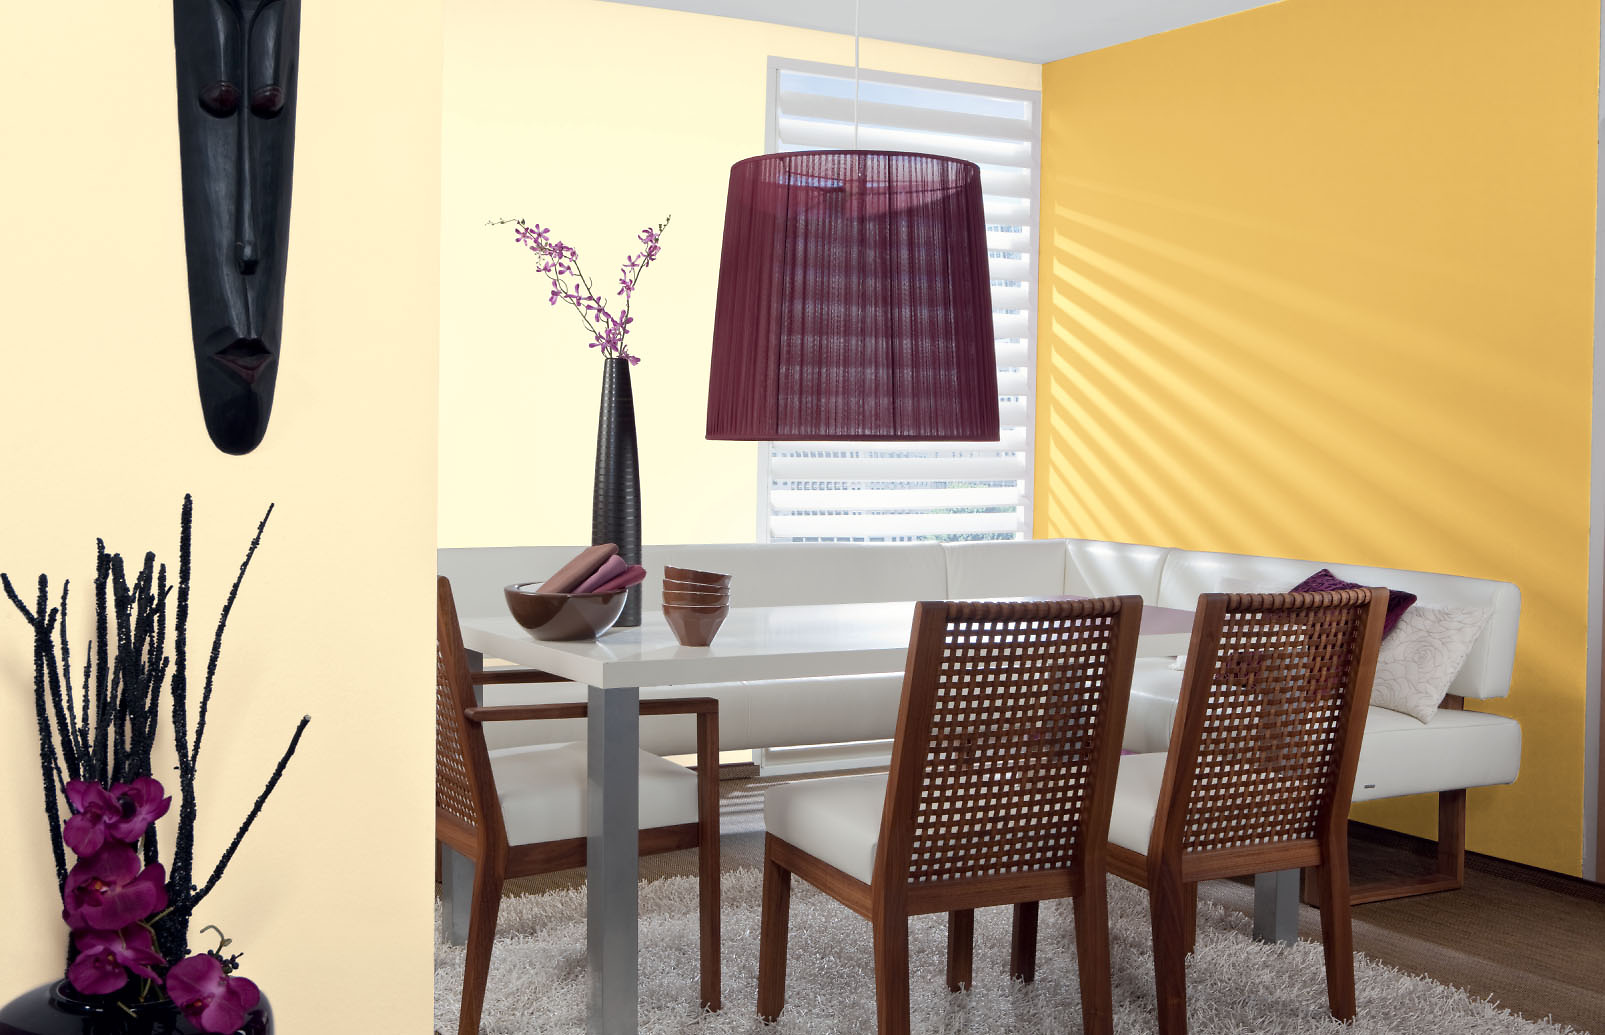 abt nfarbe farbe selber mischen gelb braun ocker alpina color sahara brown alpina farben. Black Bedroom Furniture Sets. Home Design Ideas